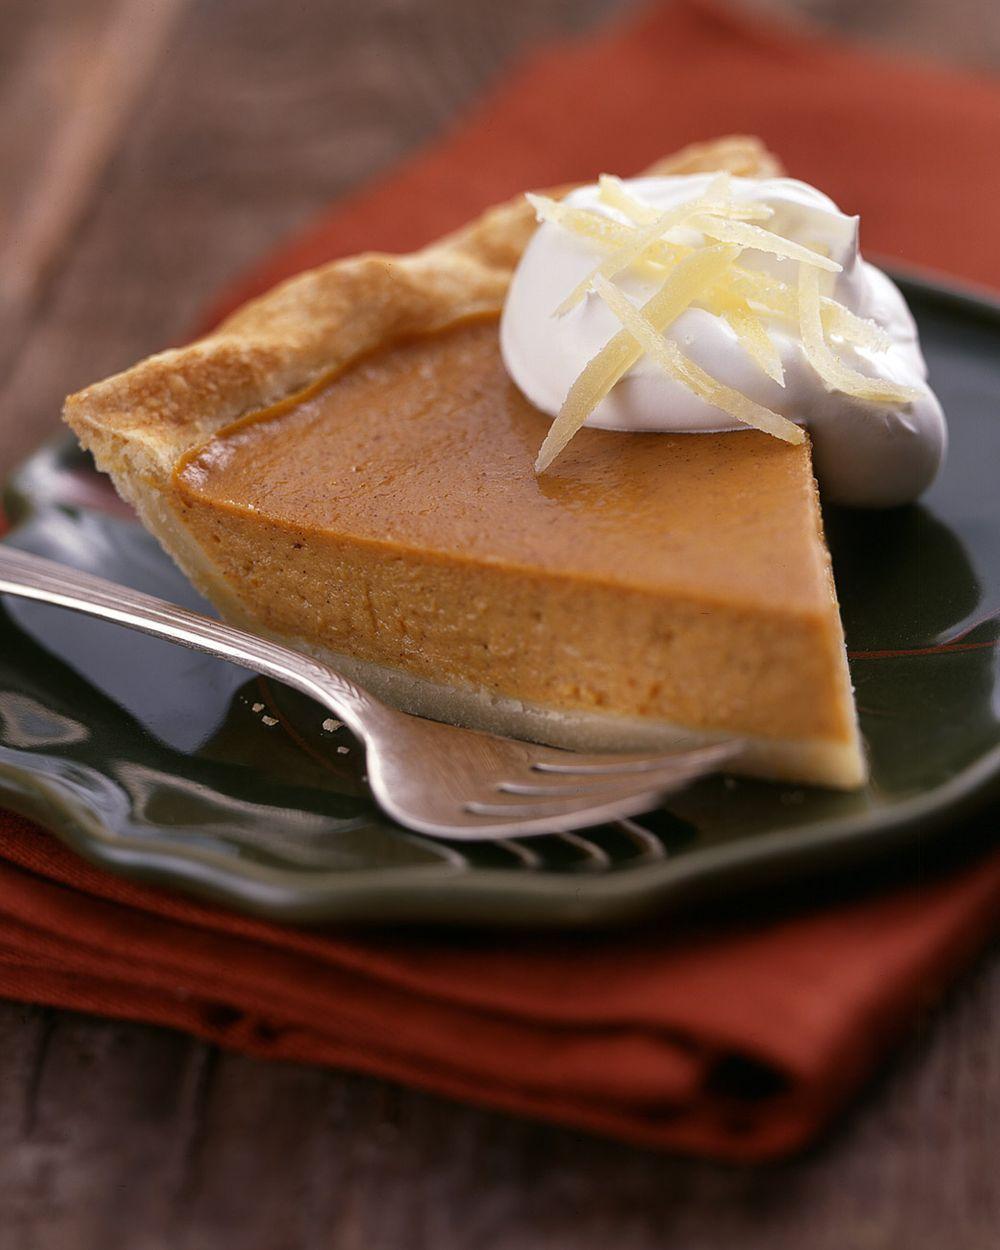 Pumpkin pie slice with whipped cream